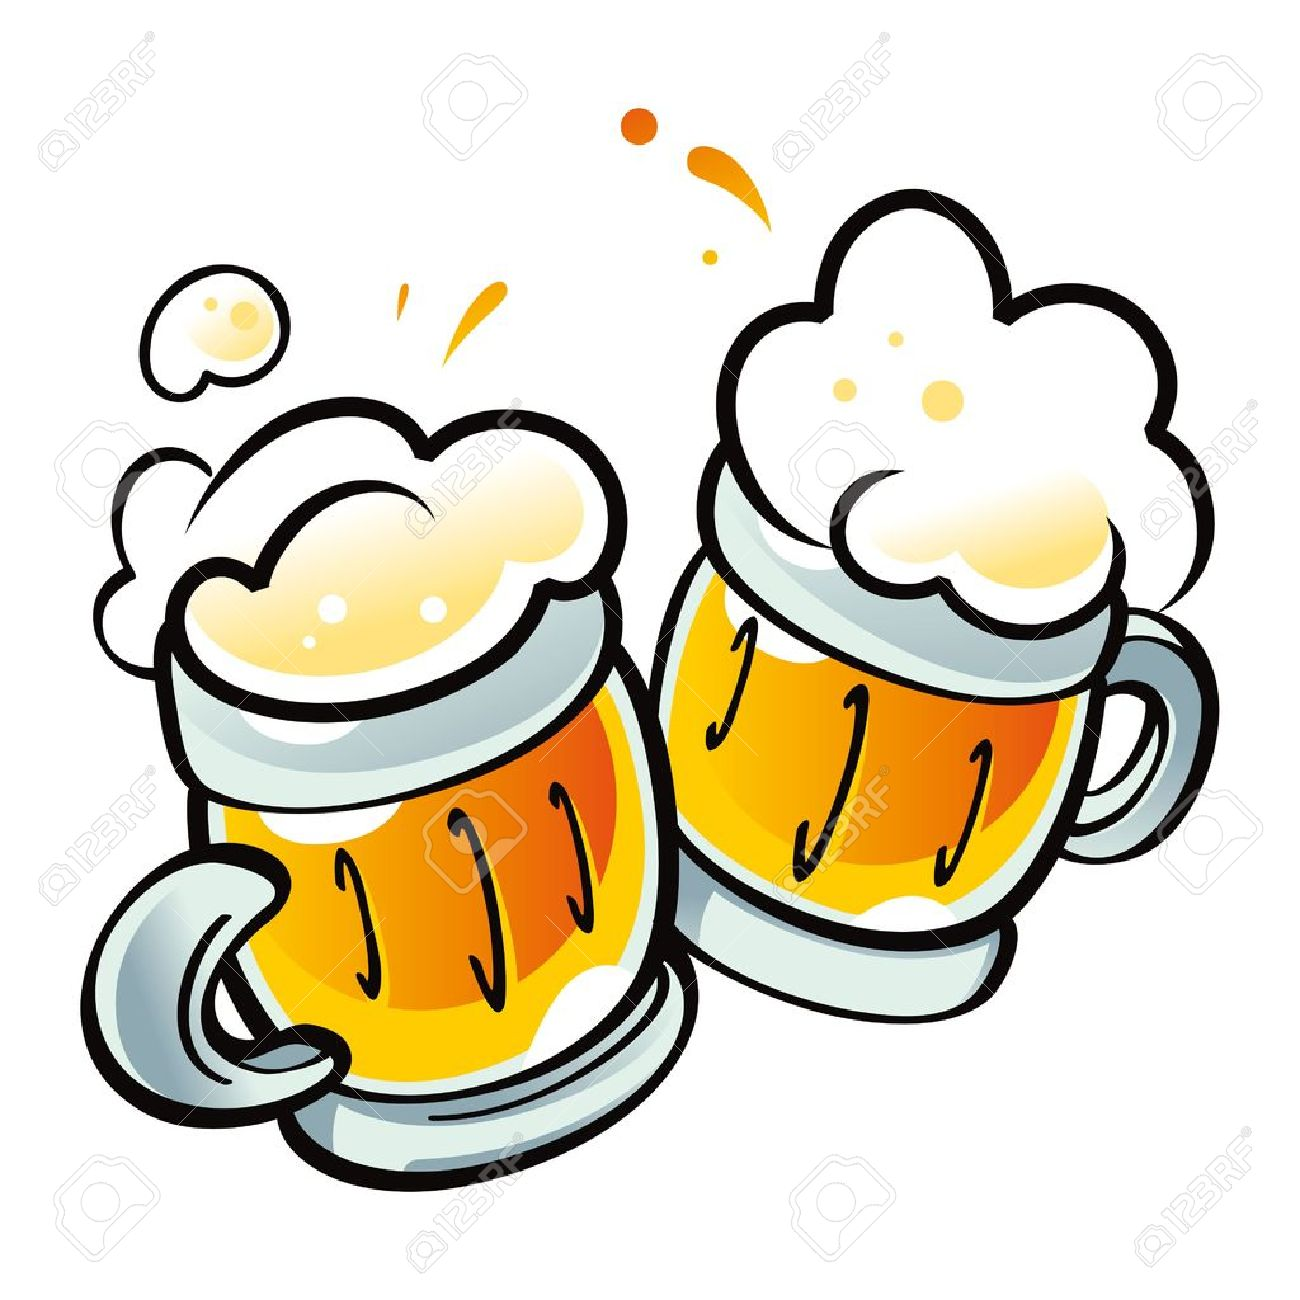 Alkohol trinken clipart clip freeuse Alkoholflaschen clipart - ClipartFest clip freeuse